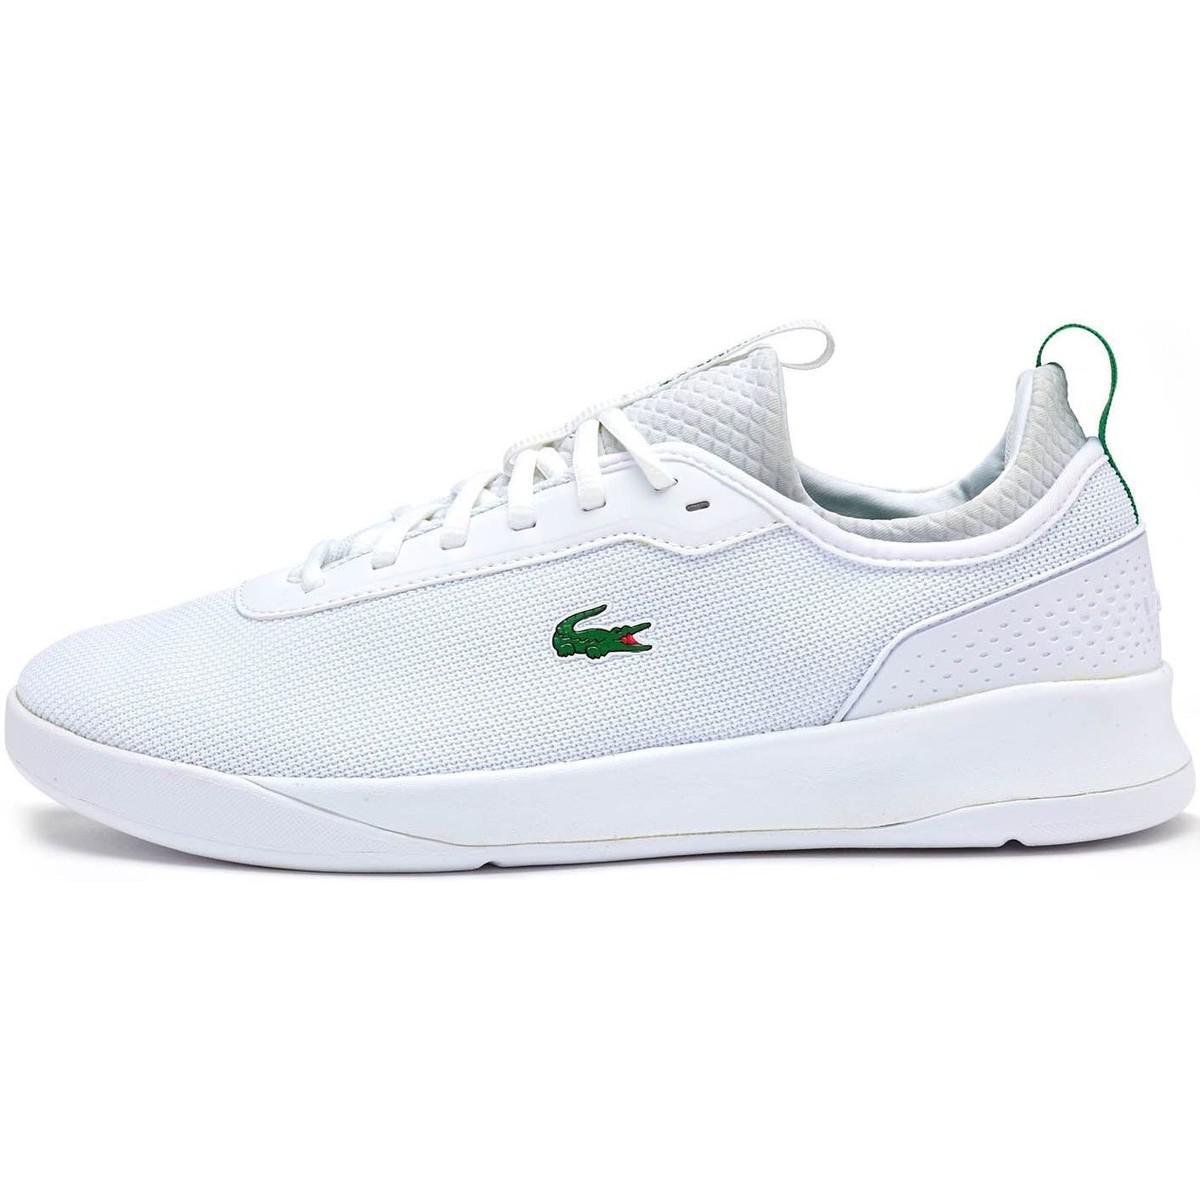 dc752735d73c2f Lacoste Lt Spirit 2.0 317 1 Spm Trainers In White Green 734spm0024 ...